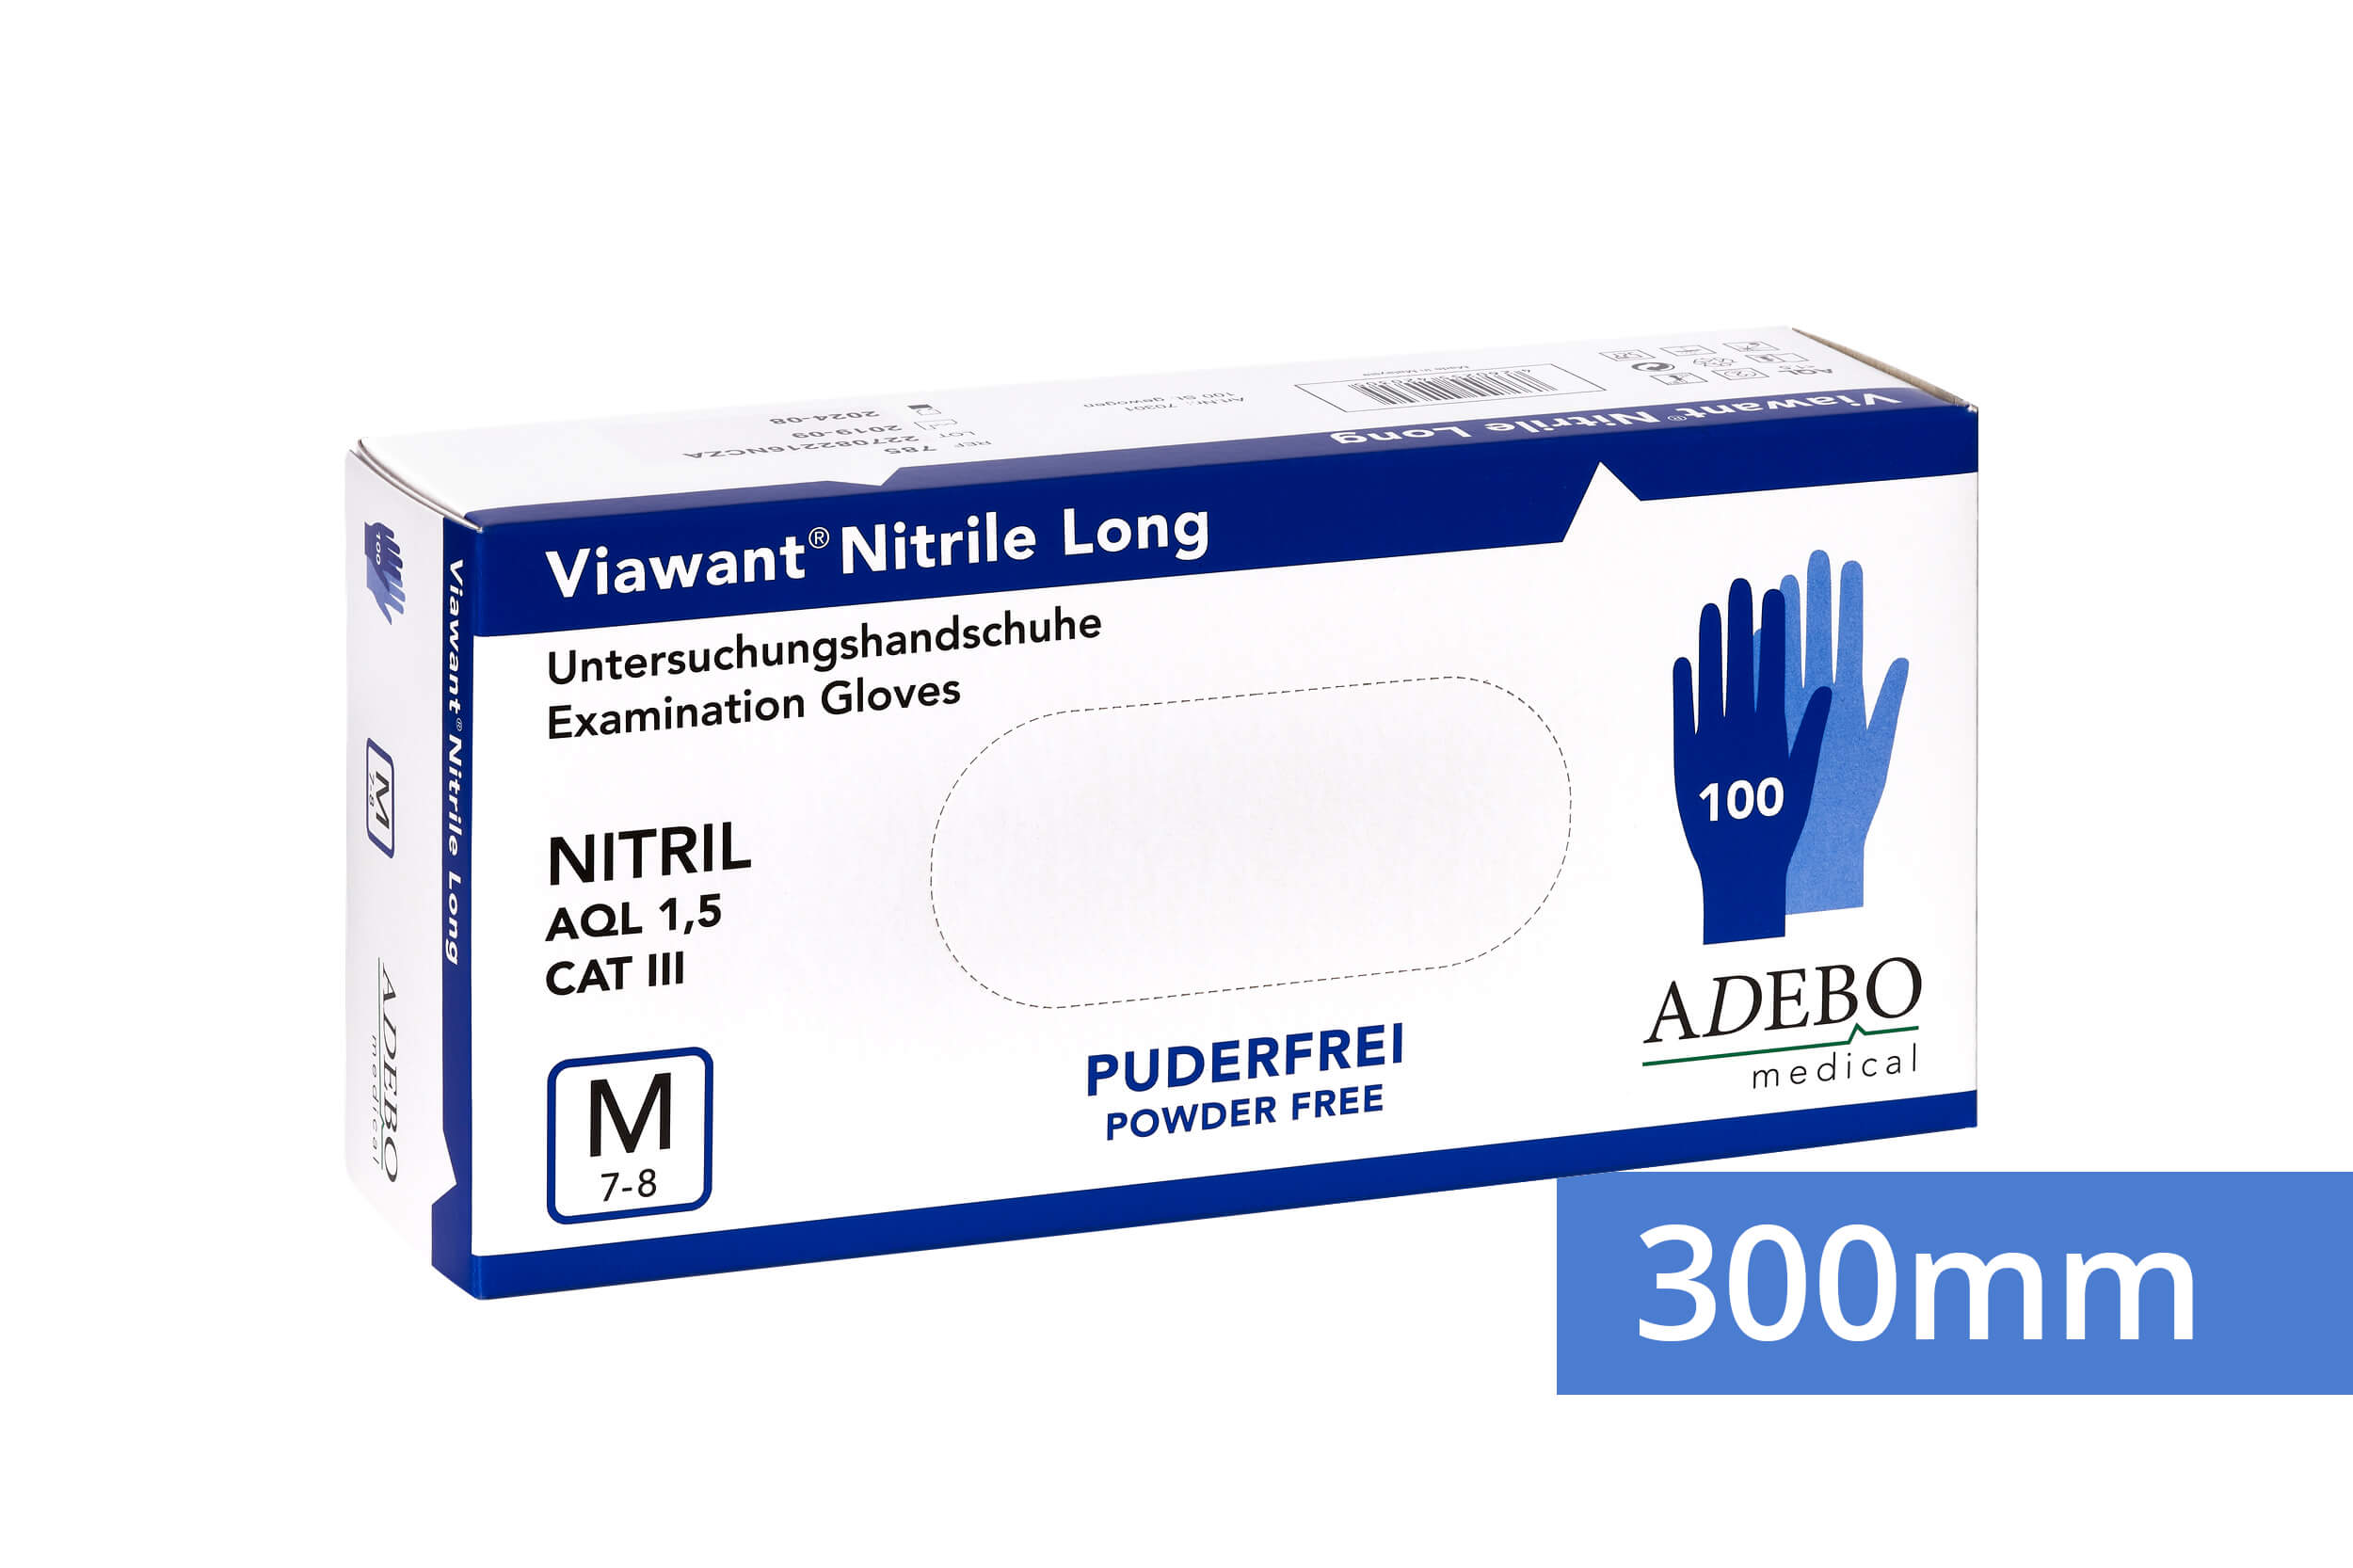 Viawant Nitrile Long - Einmalhandschuhe aus Nitril